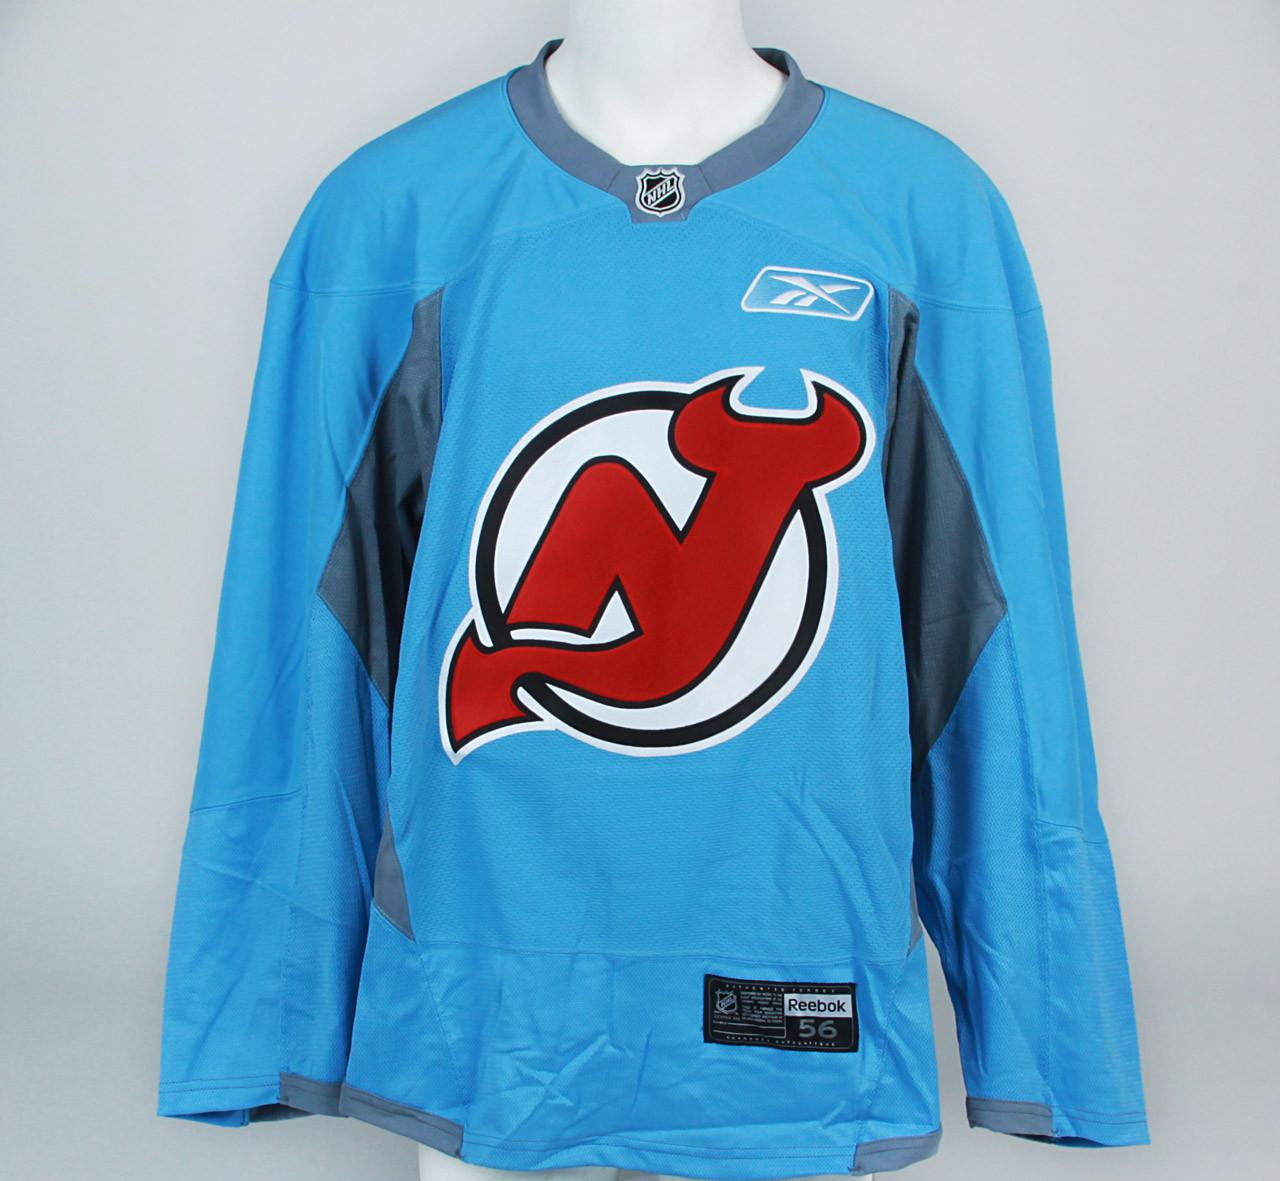 ... Practice Jersey - New Jersey Devils - Baby Blue Reebok Size 56. Image 1 15047fb81